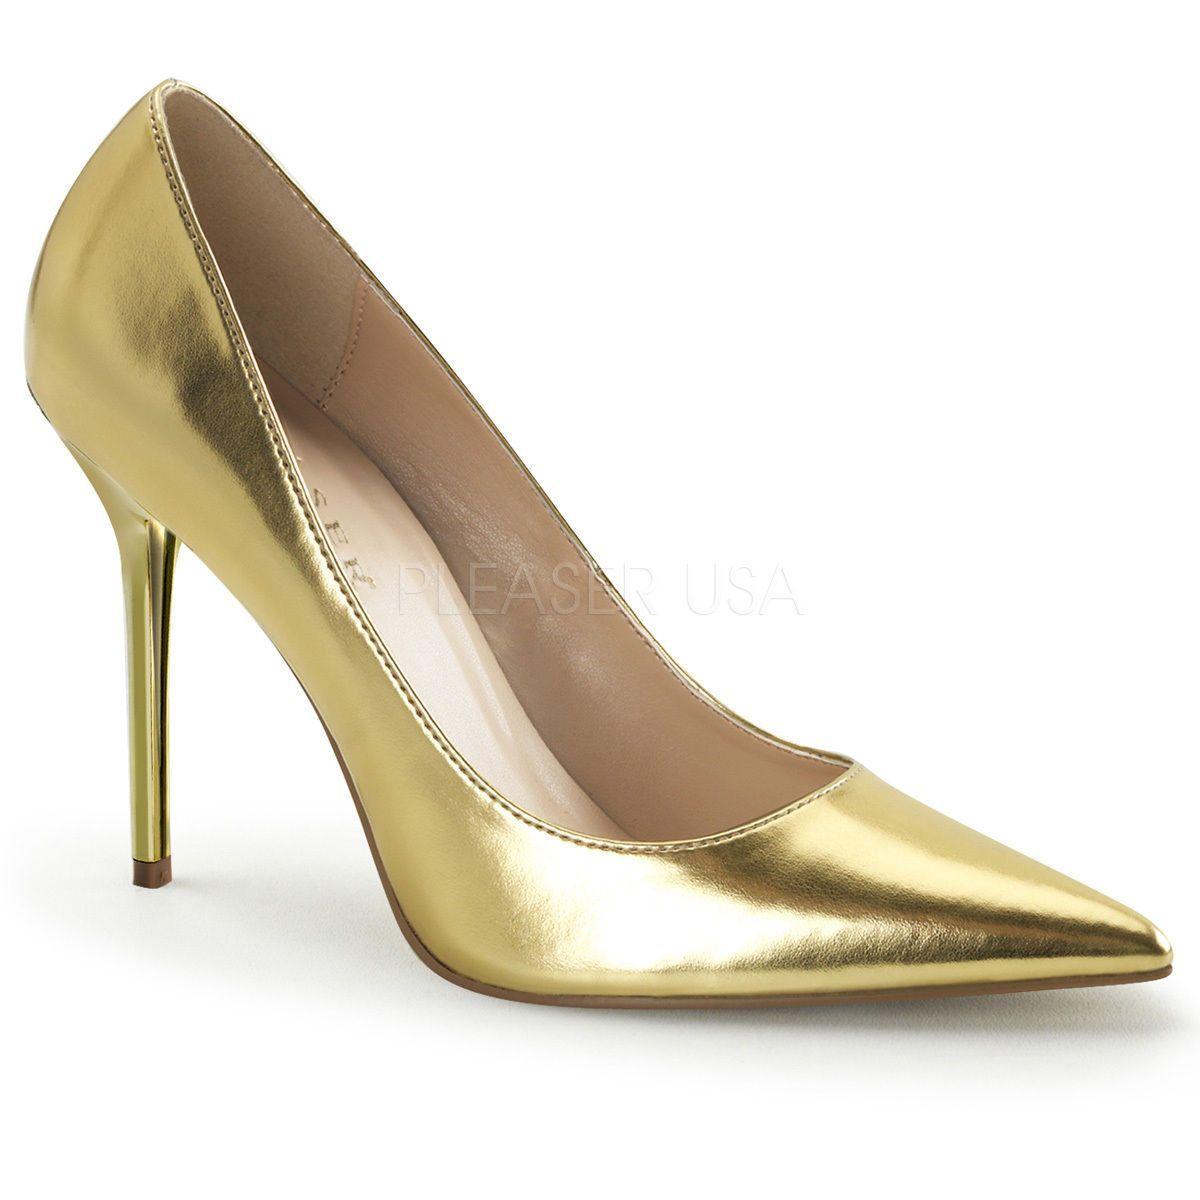 d22b26fa12c Details about Black Shiny Pointy Toe Heels Mens Crossdresser Drag ...